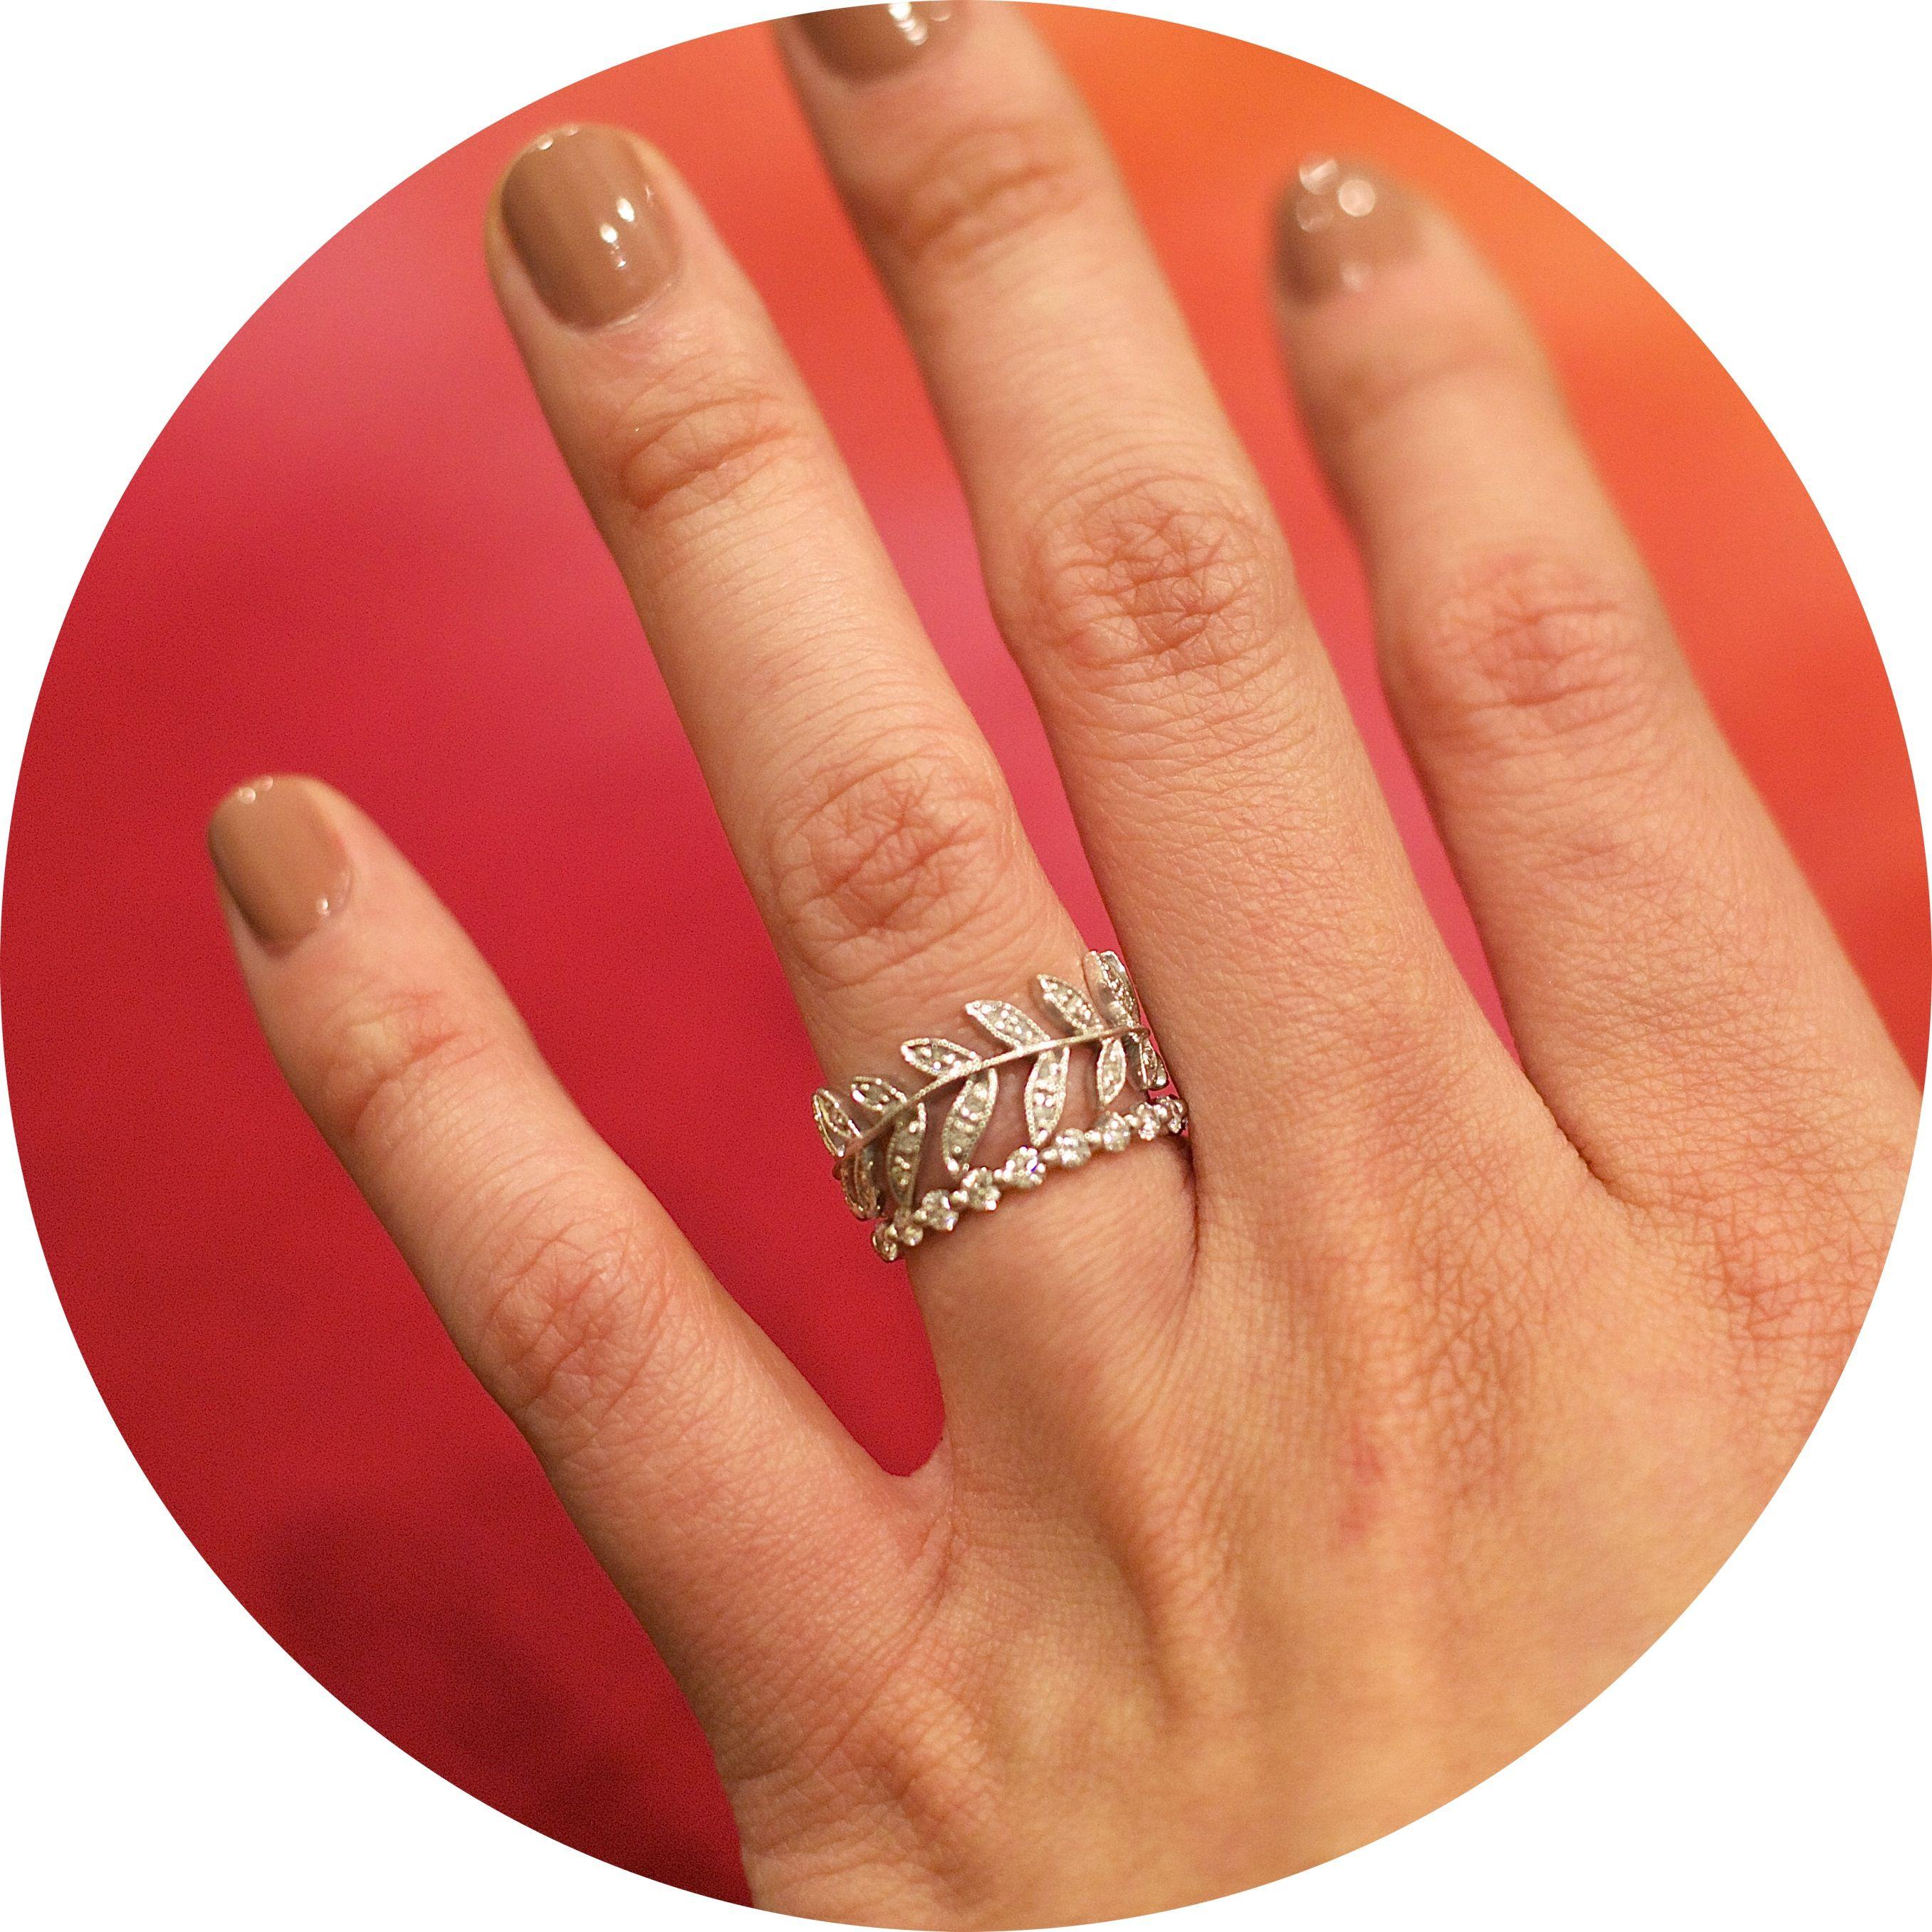 Symbols of love Alternative wedding and engagement ring